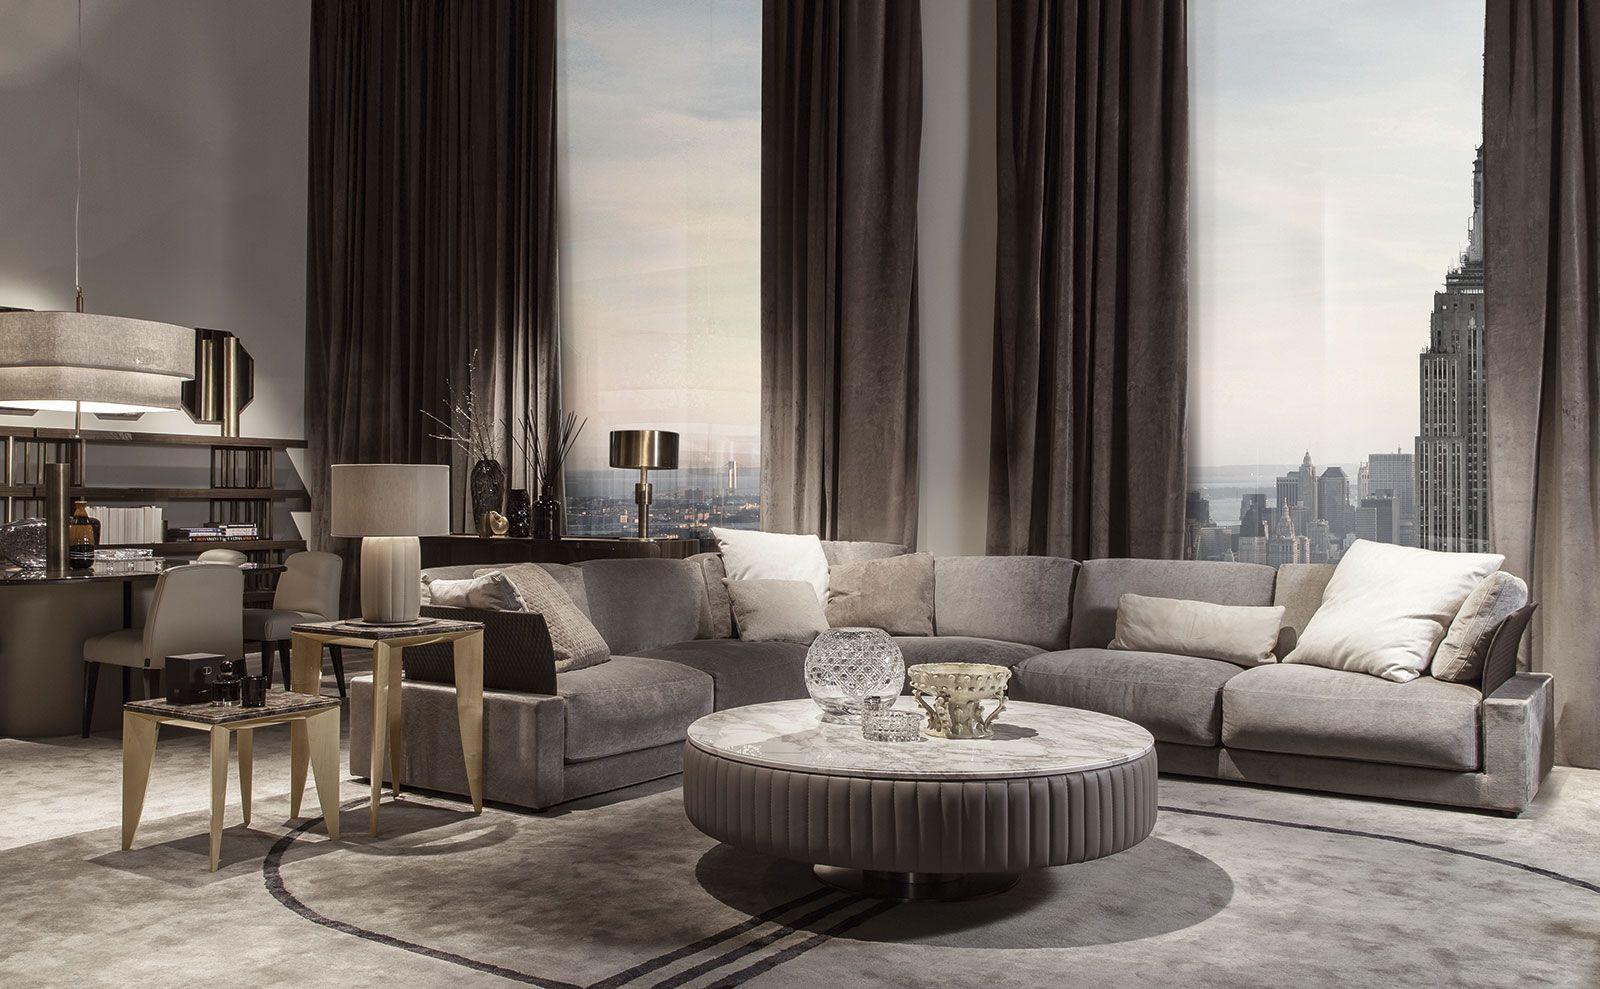 Daytona arredamento contemporaneo moderno di lusso, arredo e mobili ...